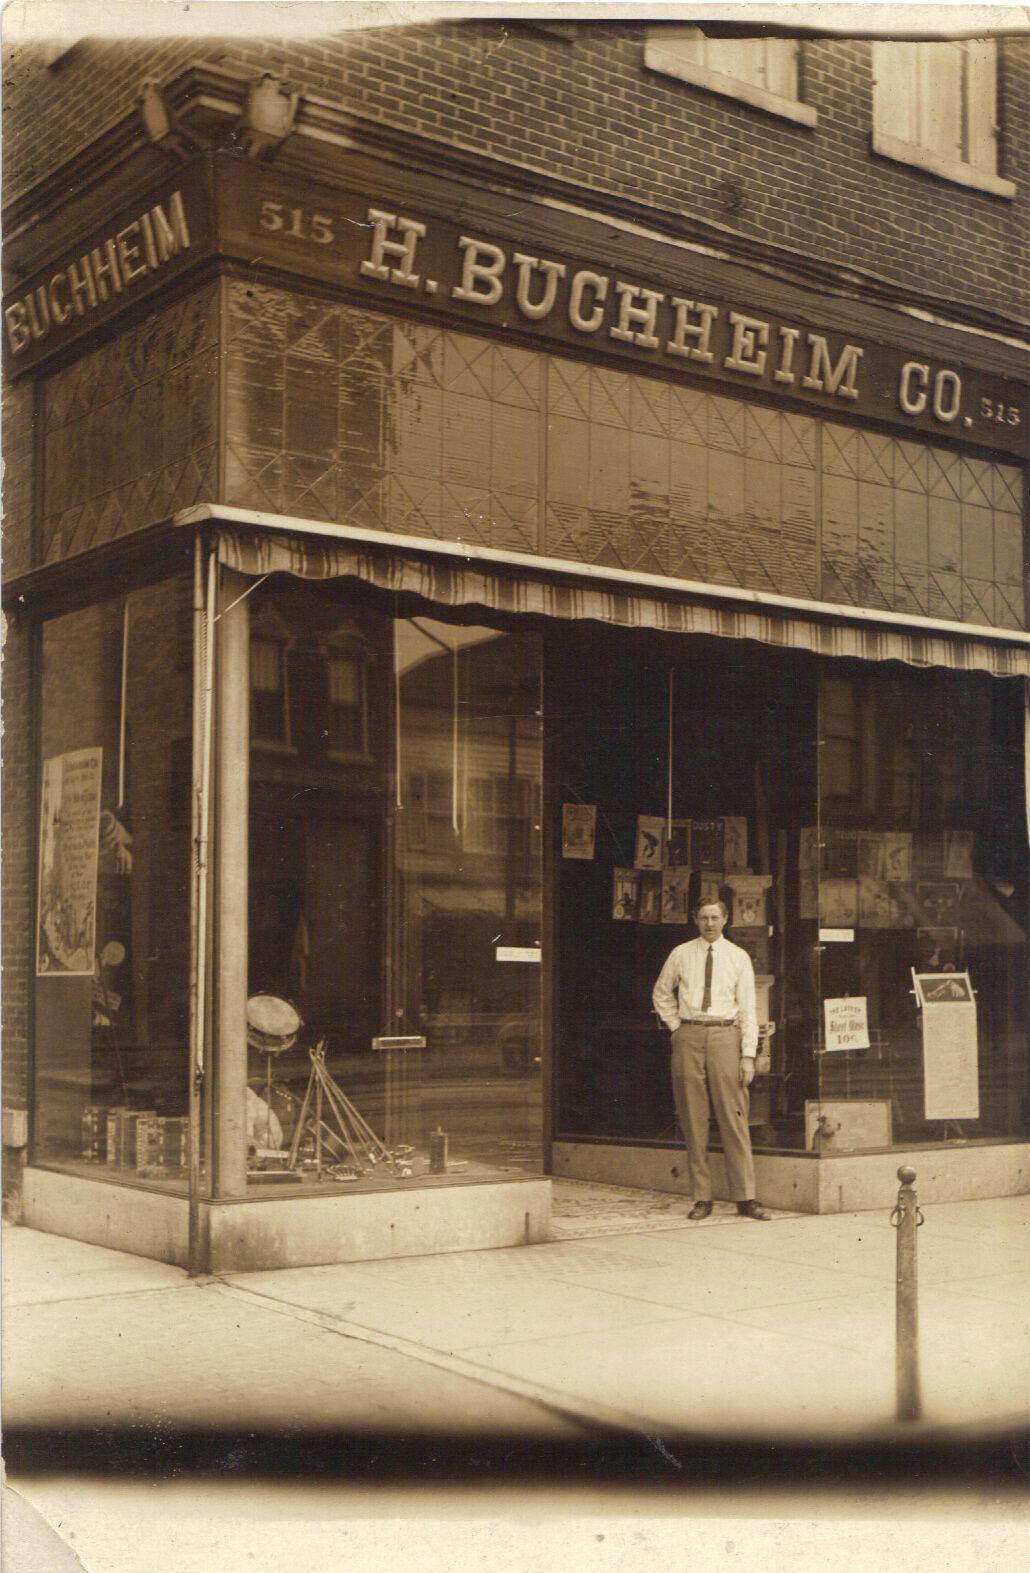 H. Buchheim store